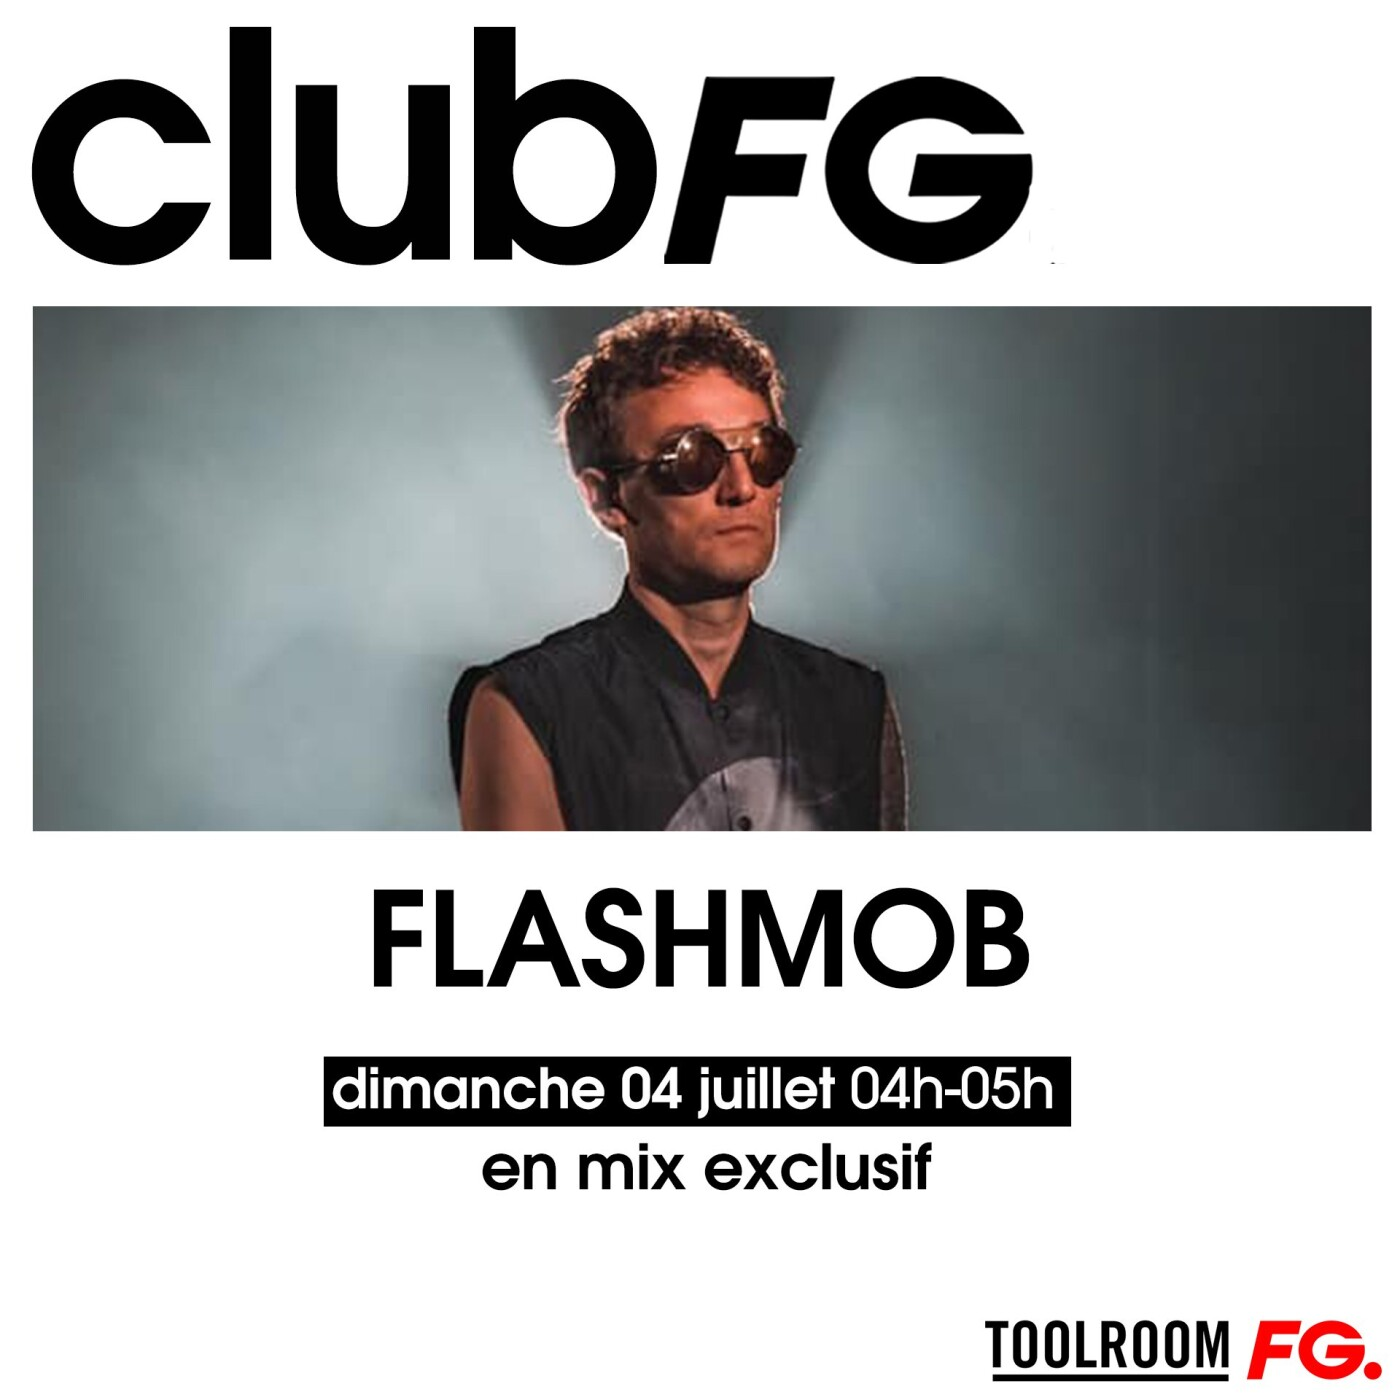 CLUB FG : FLASHMOB